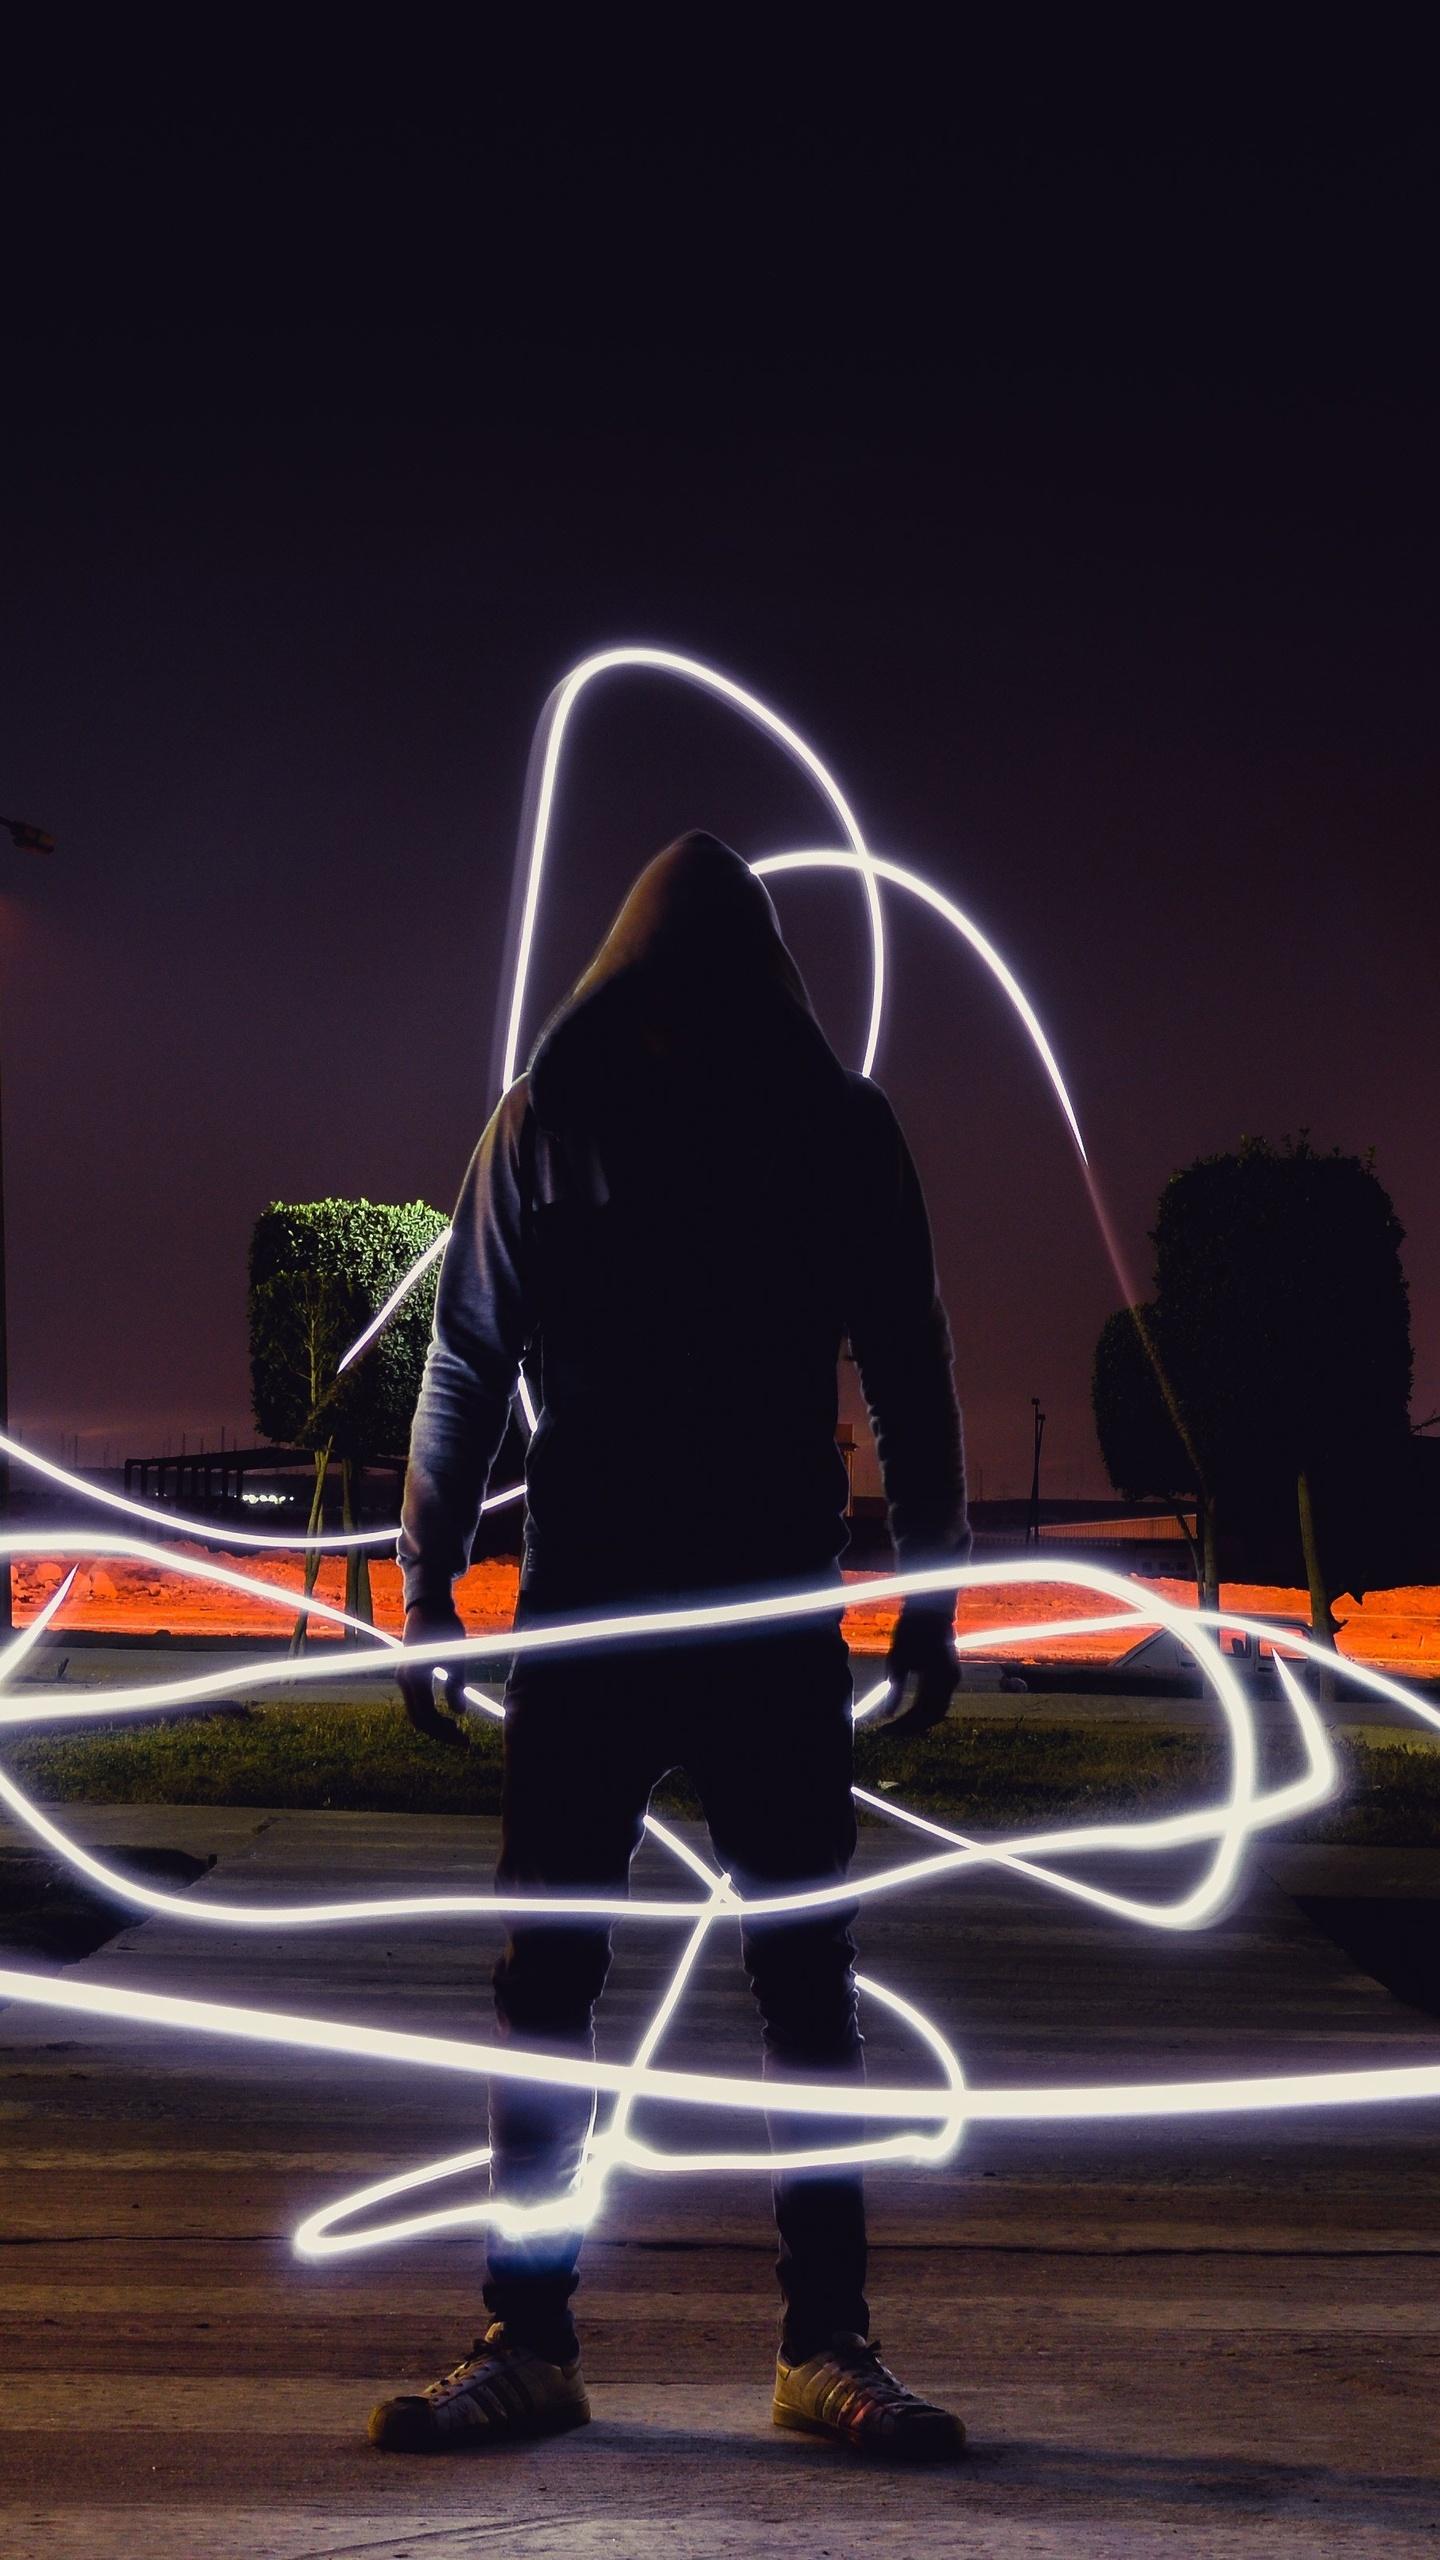 person-wearing-hoodie-jacket-neon-light-kx.jpg